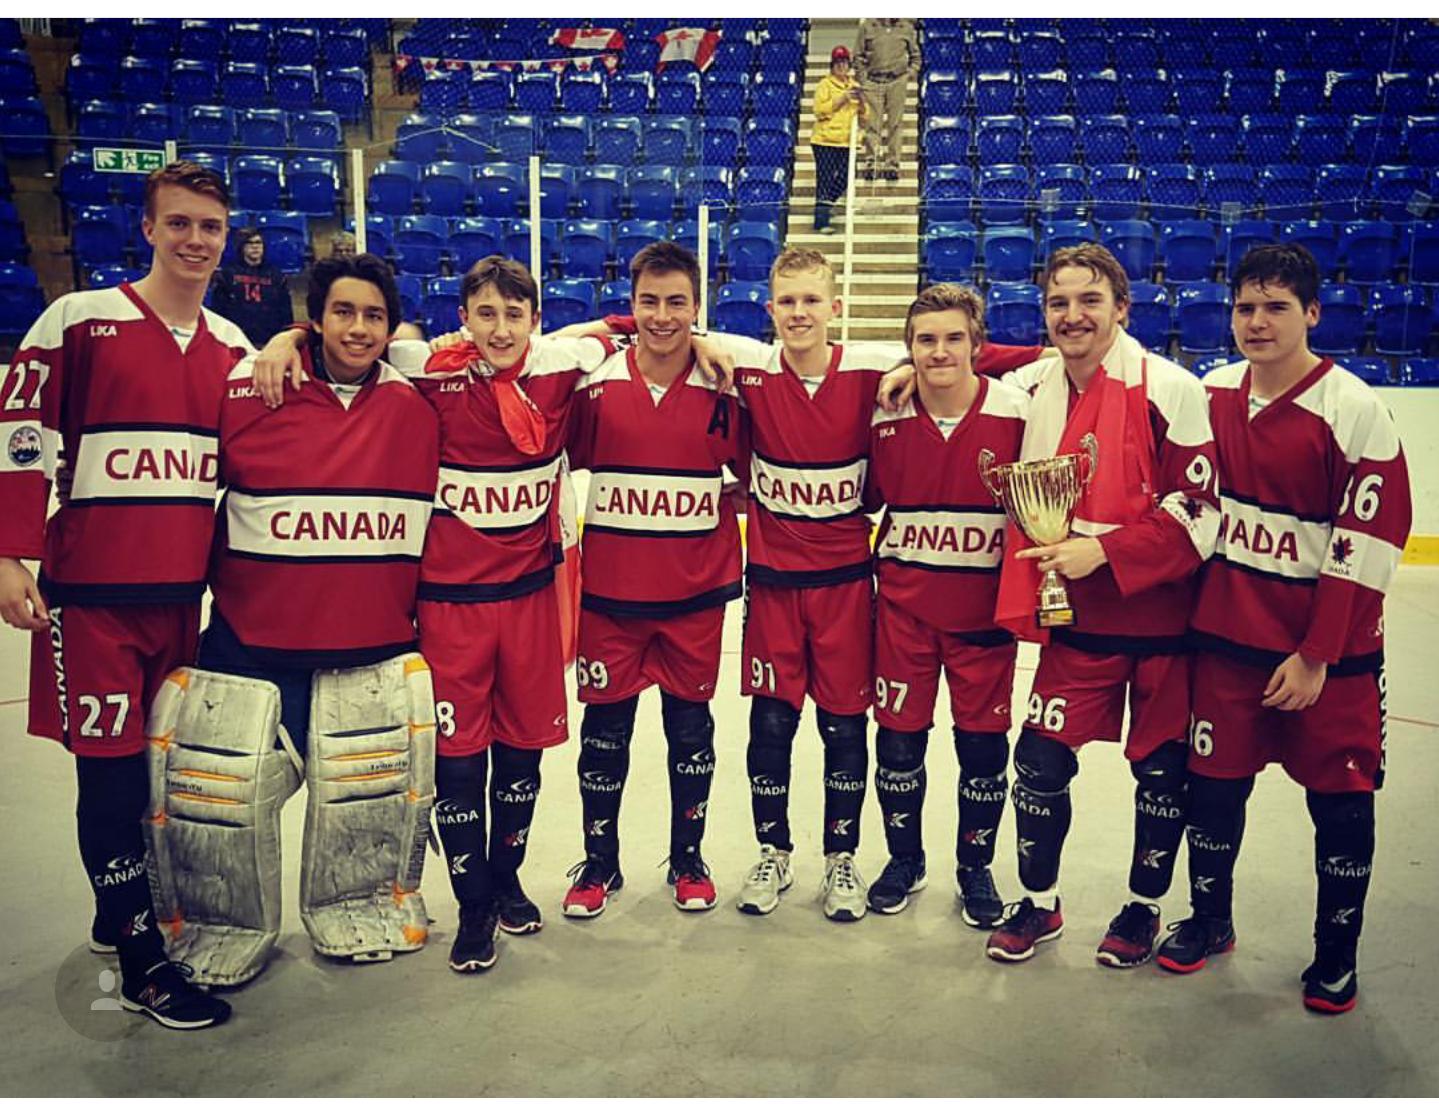 U18 Junior Team Canada - Alberta Boys